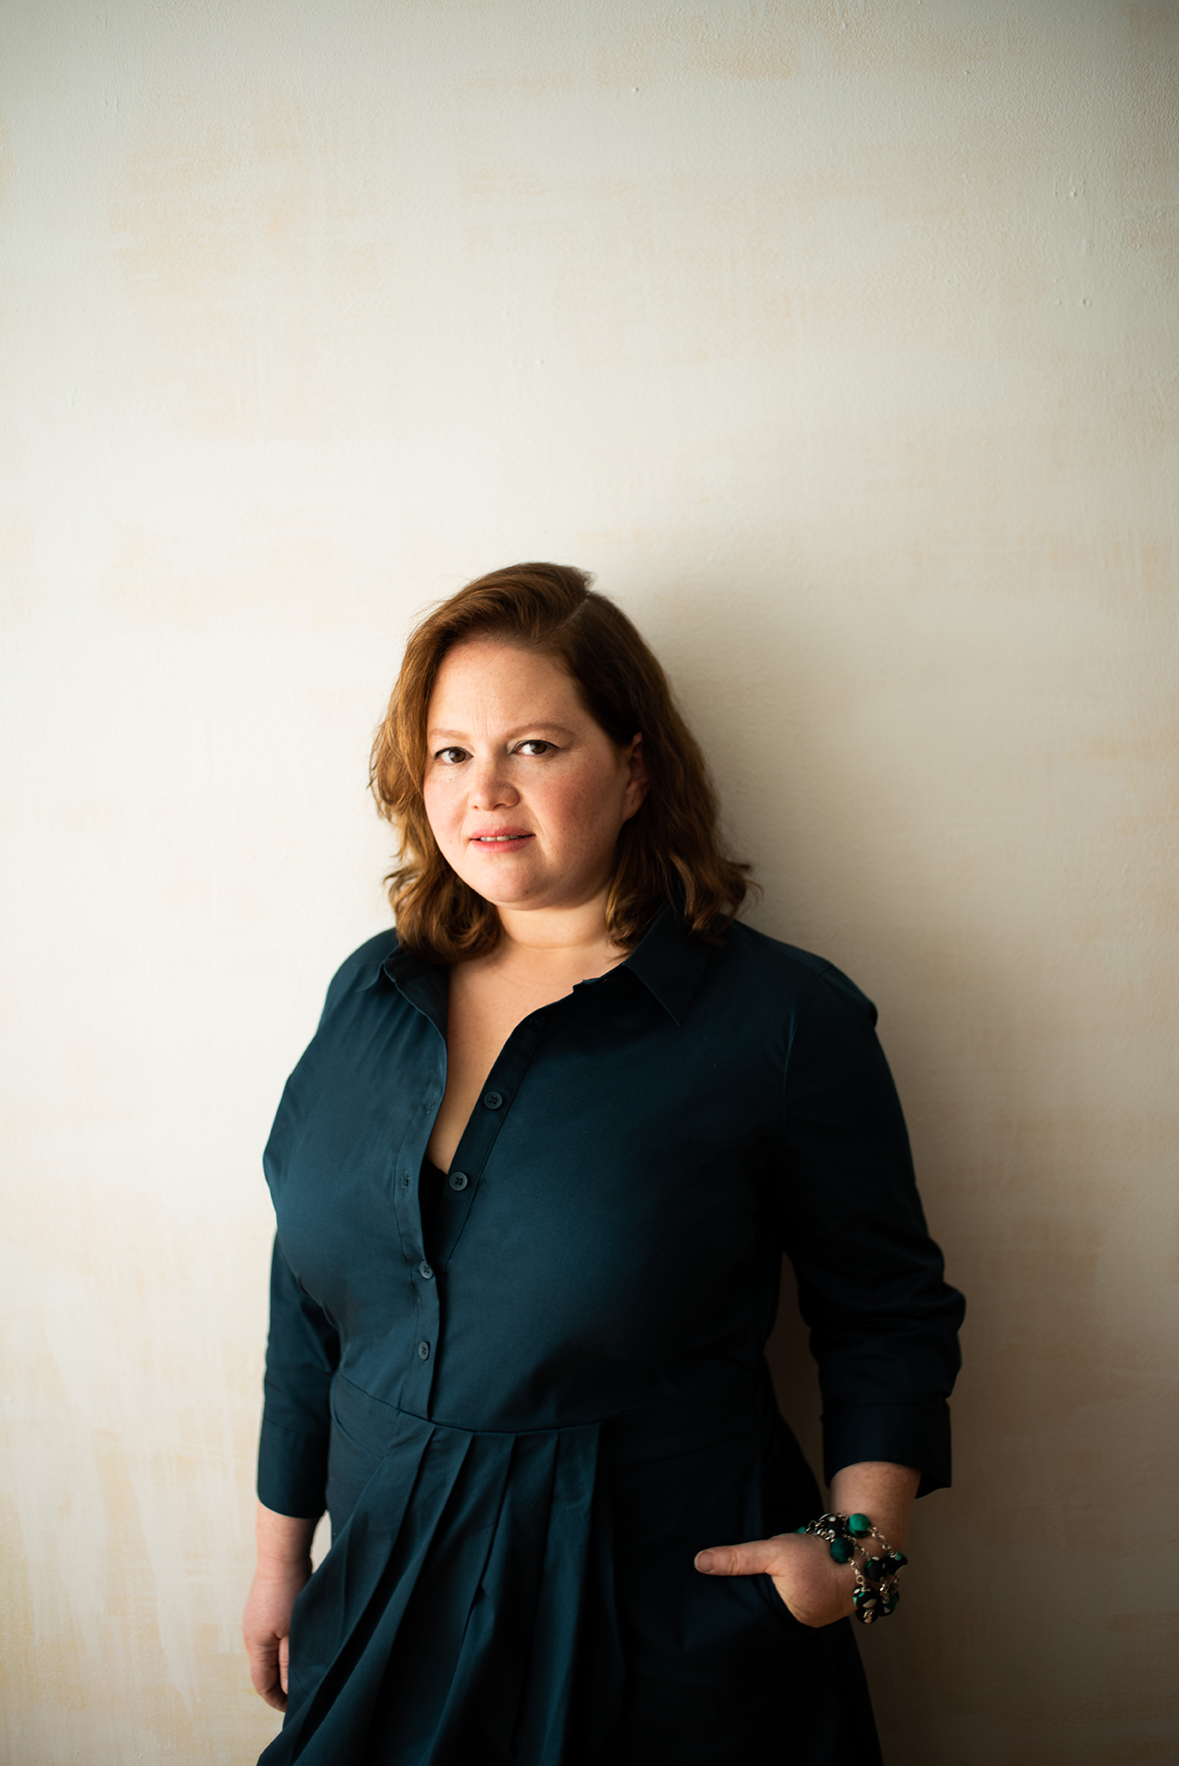 NYC Art Director Portrait